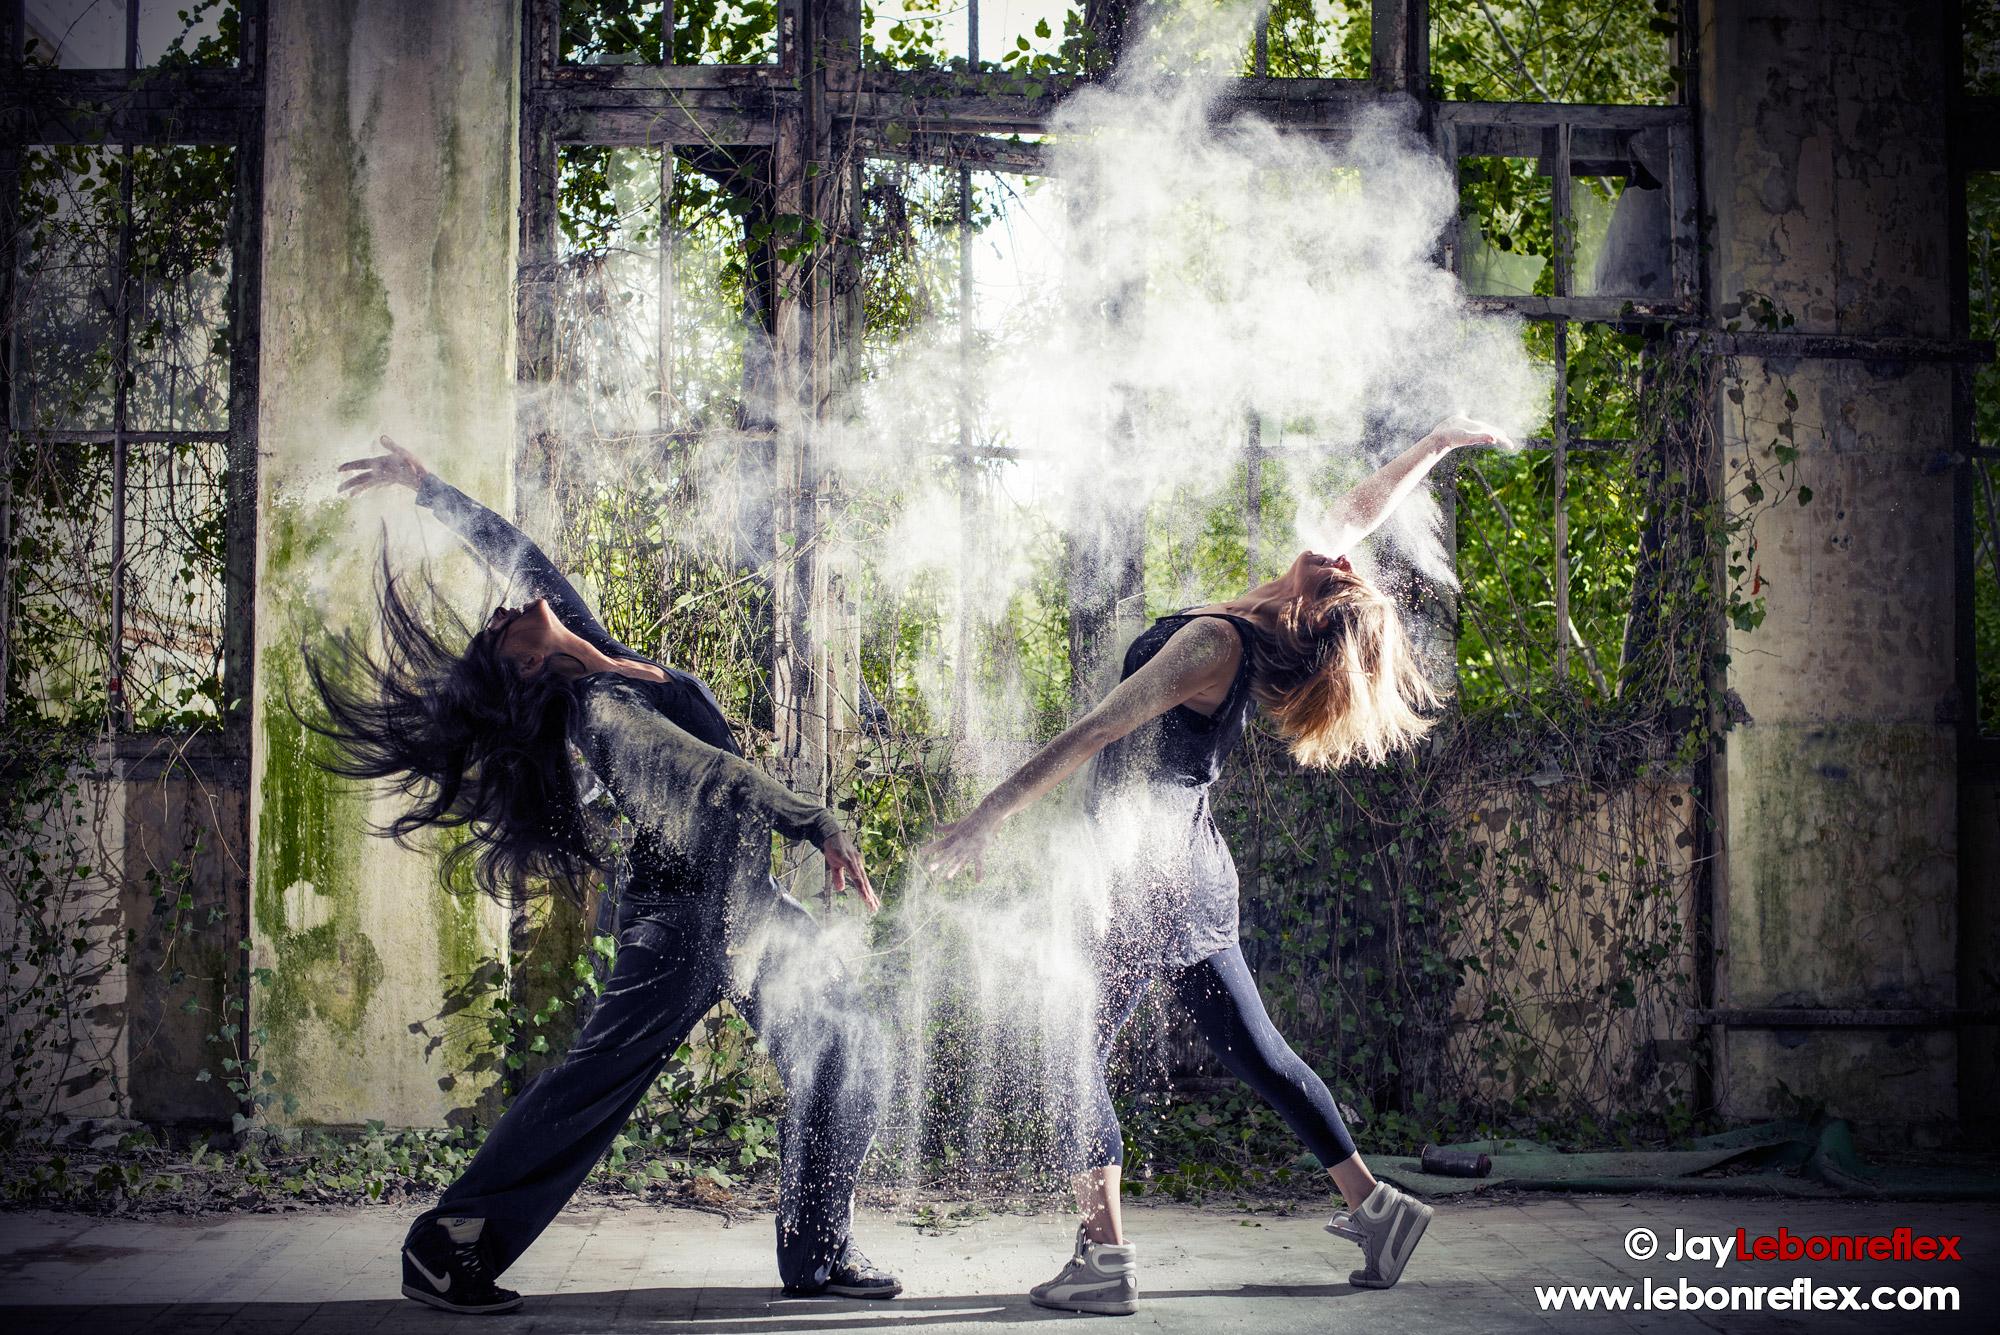 Dance and the Flour – Corinne et Edwige